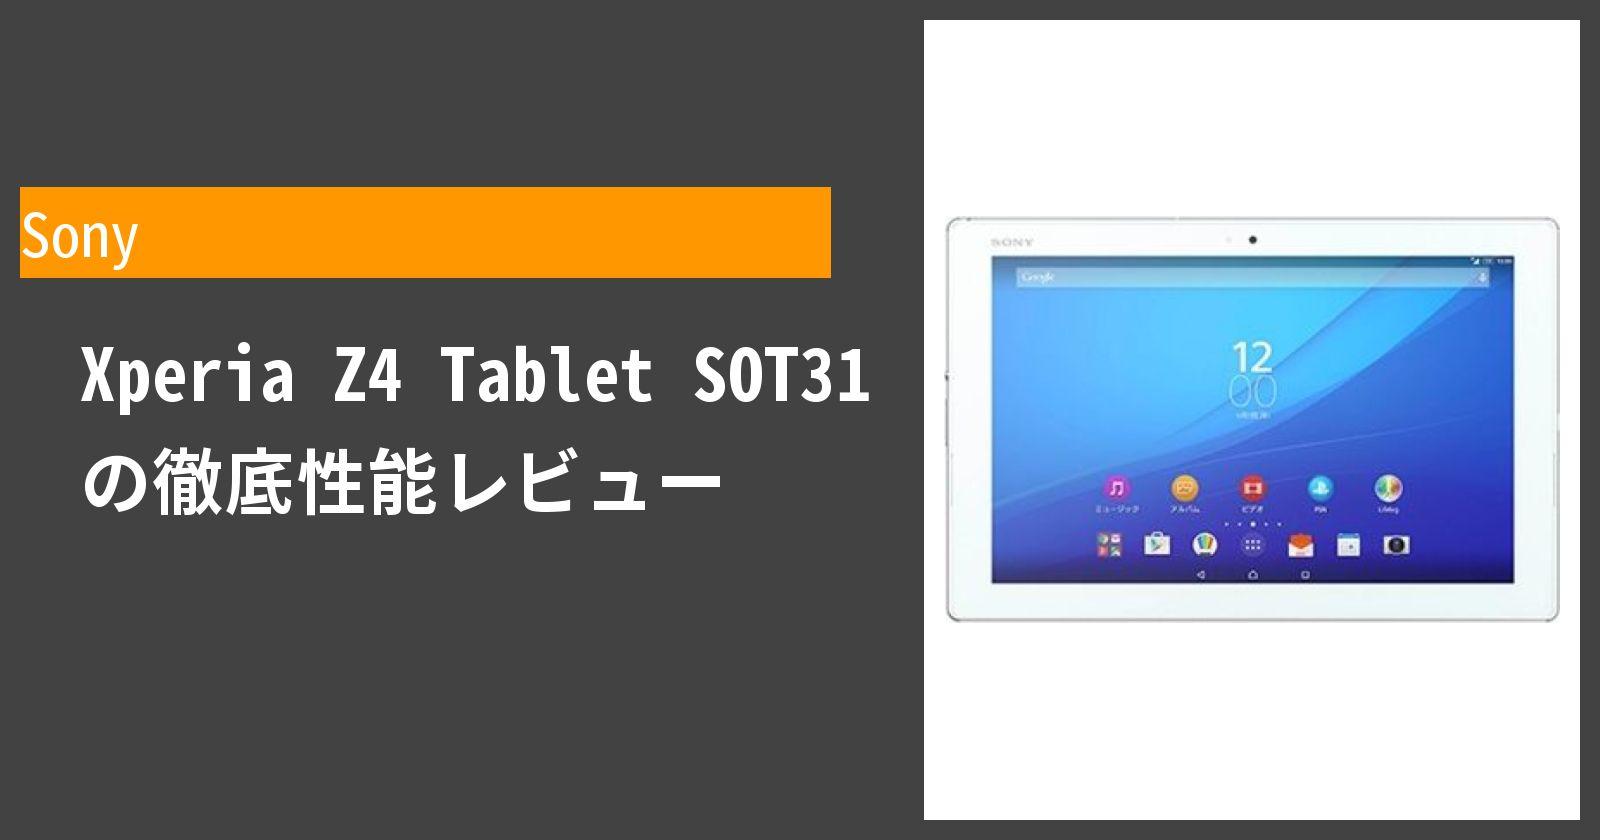 Xperia Z4 Tablet SOT31 au の徹底性能レビュー